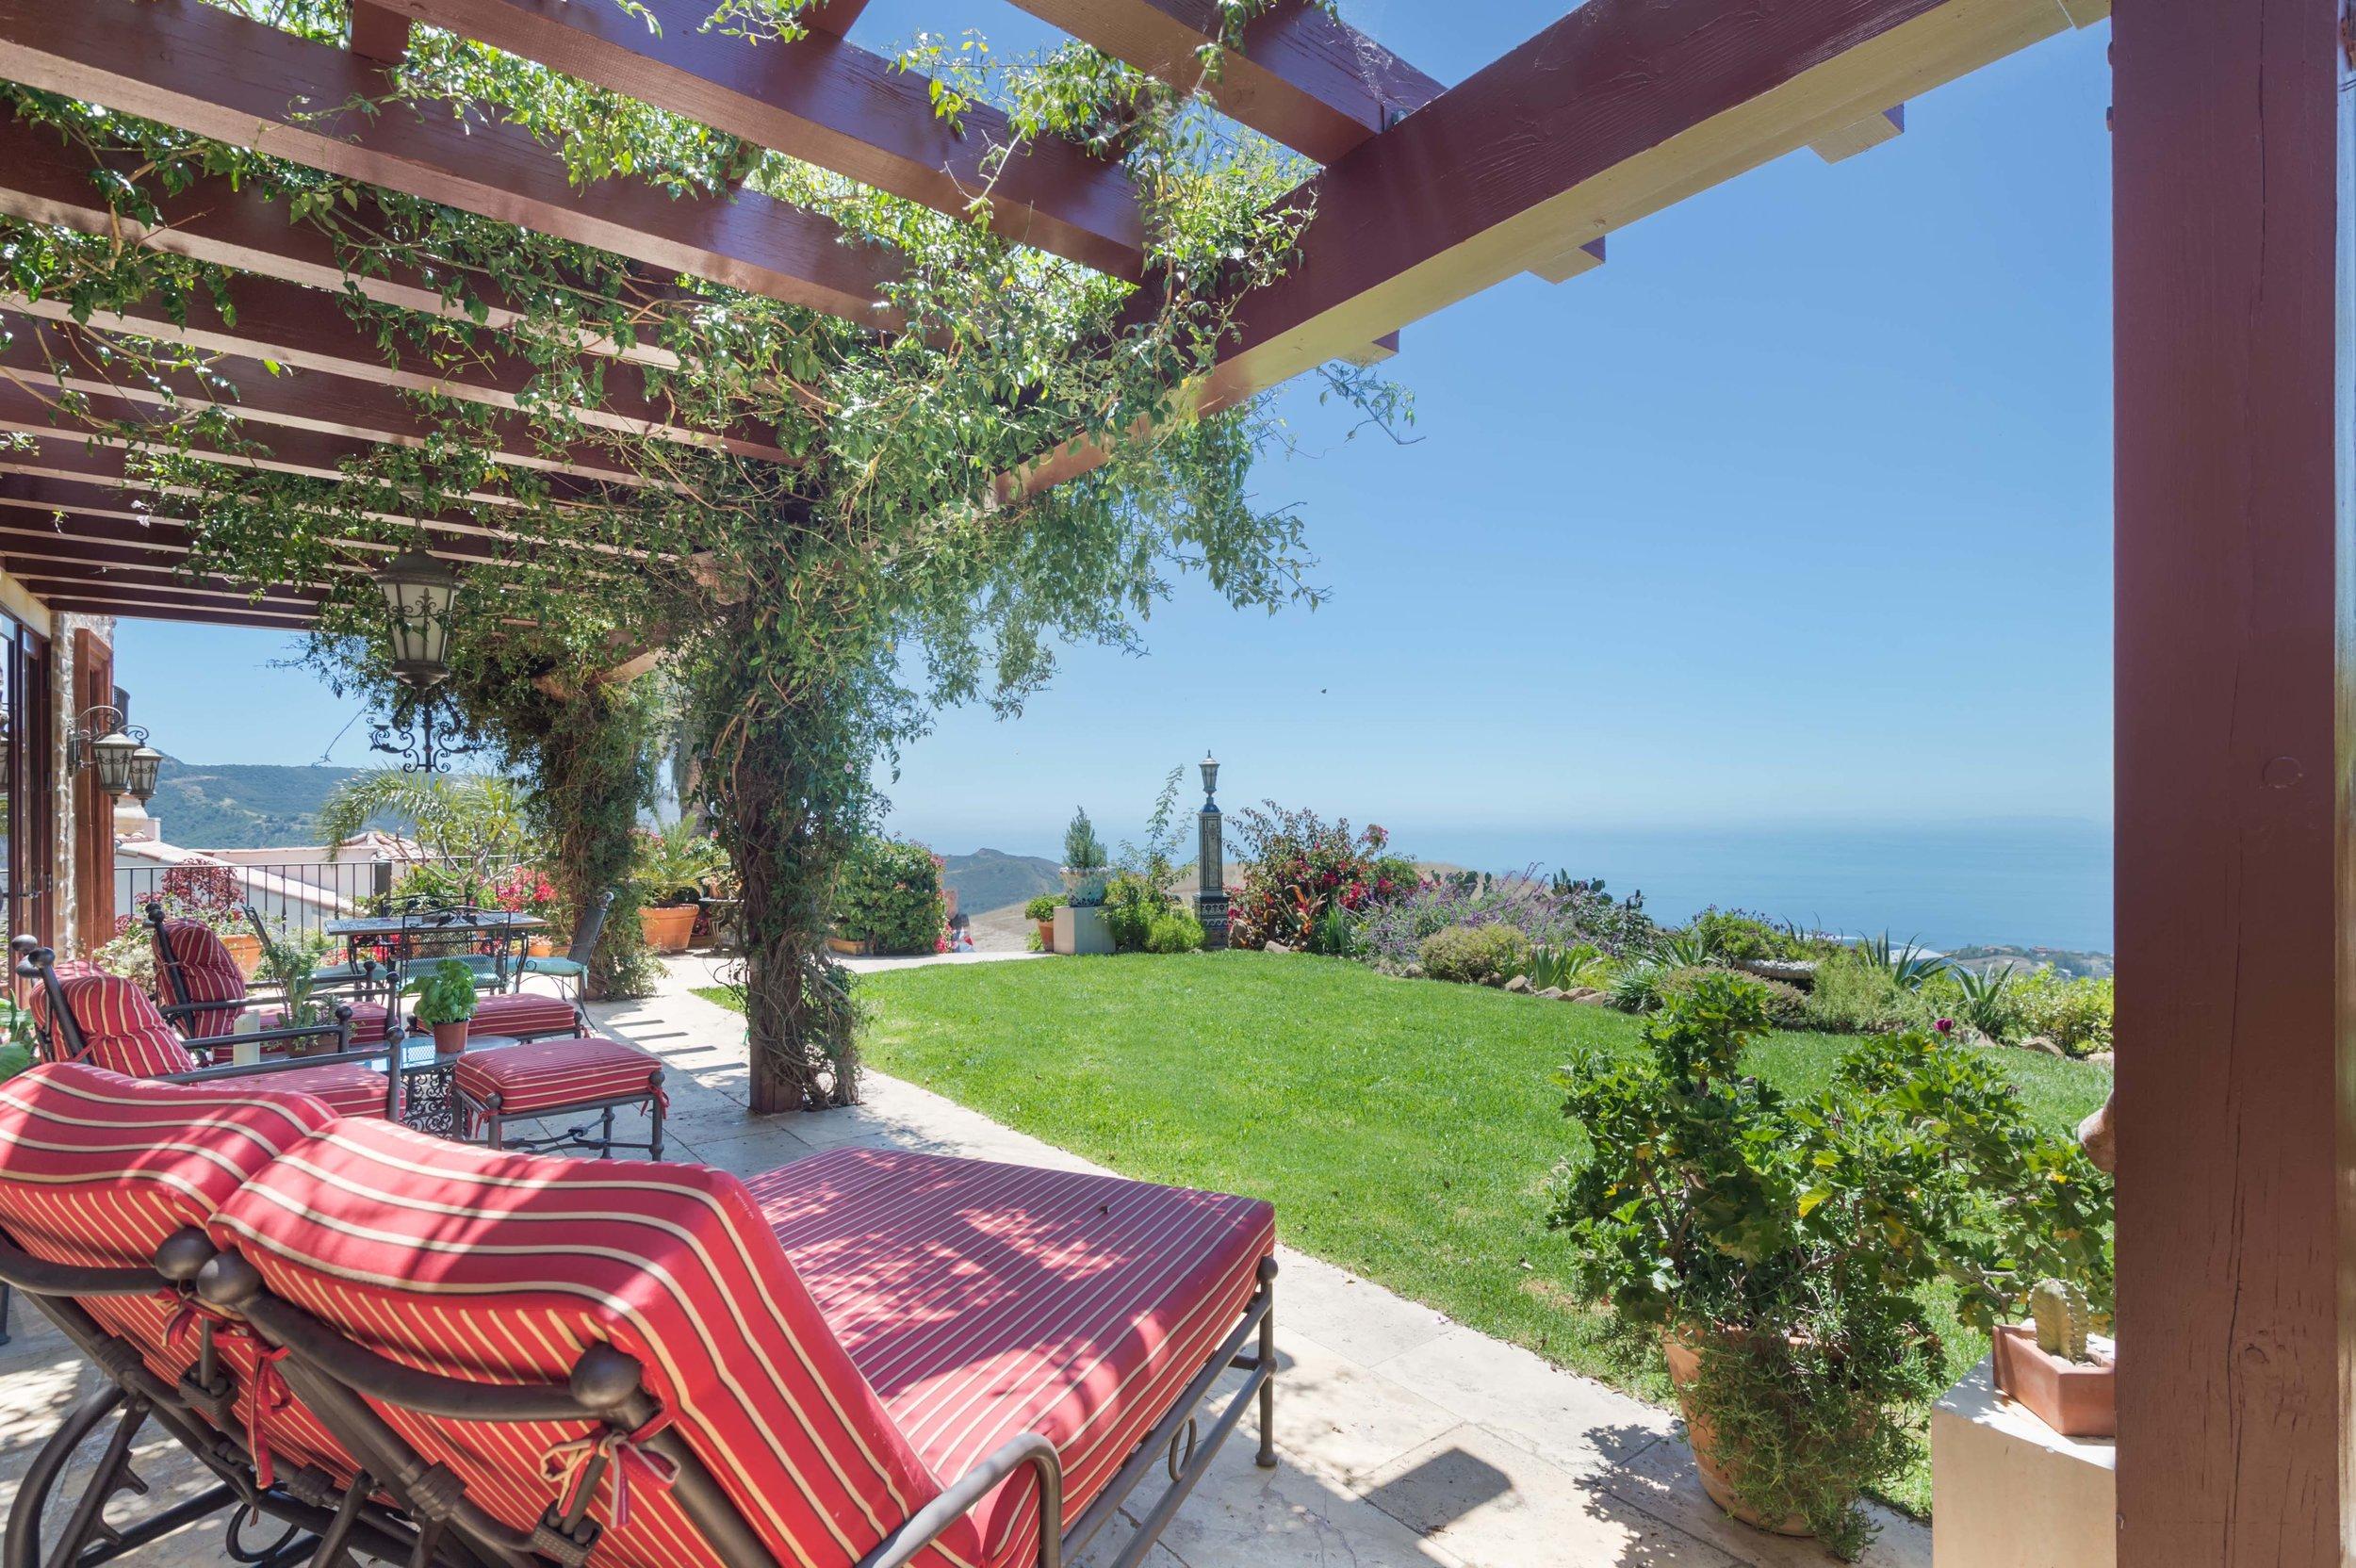 001 Ocean View 26303 Lockwood Road Malibu For Sale Lease The Malibu Life Team Luxury Real Estate.jpg